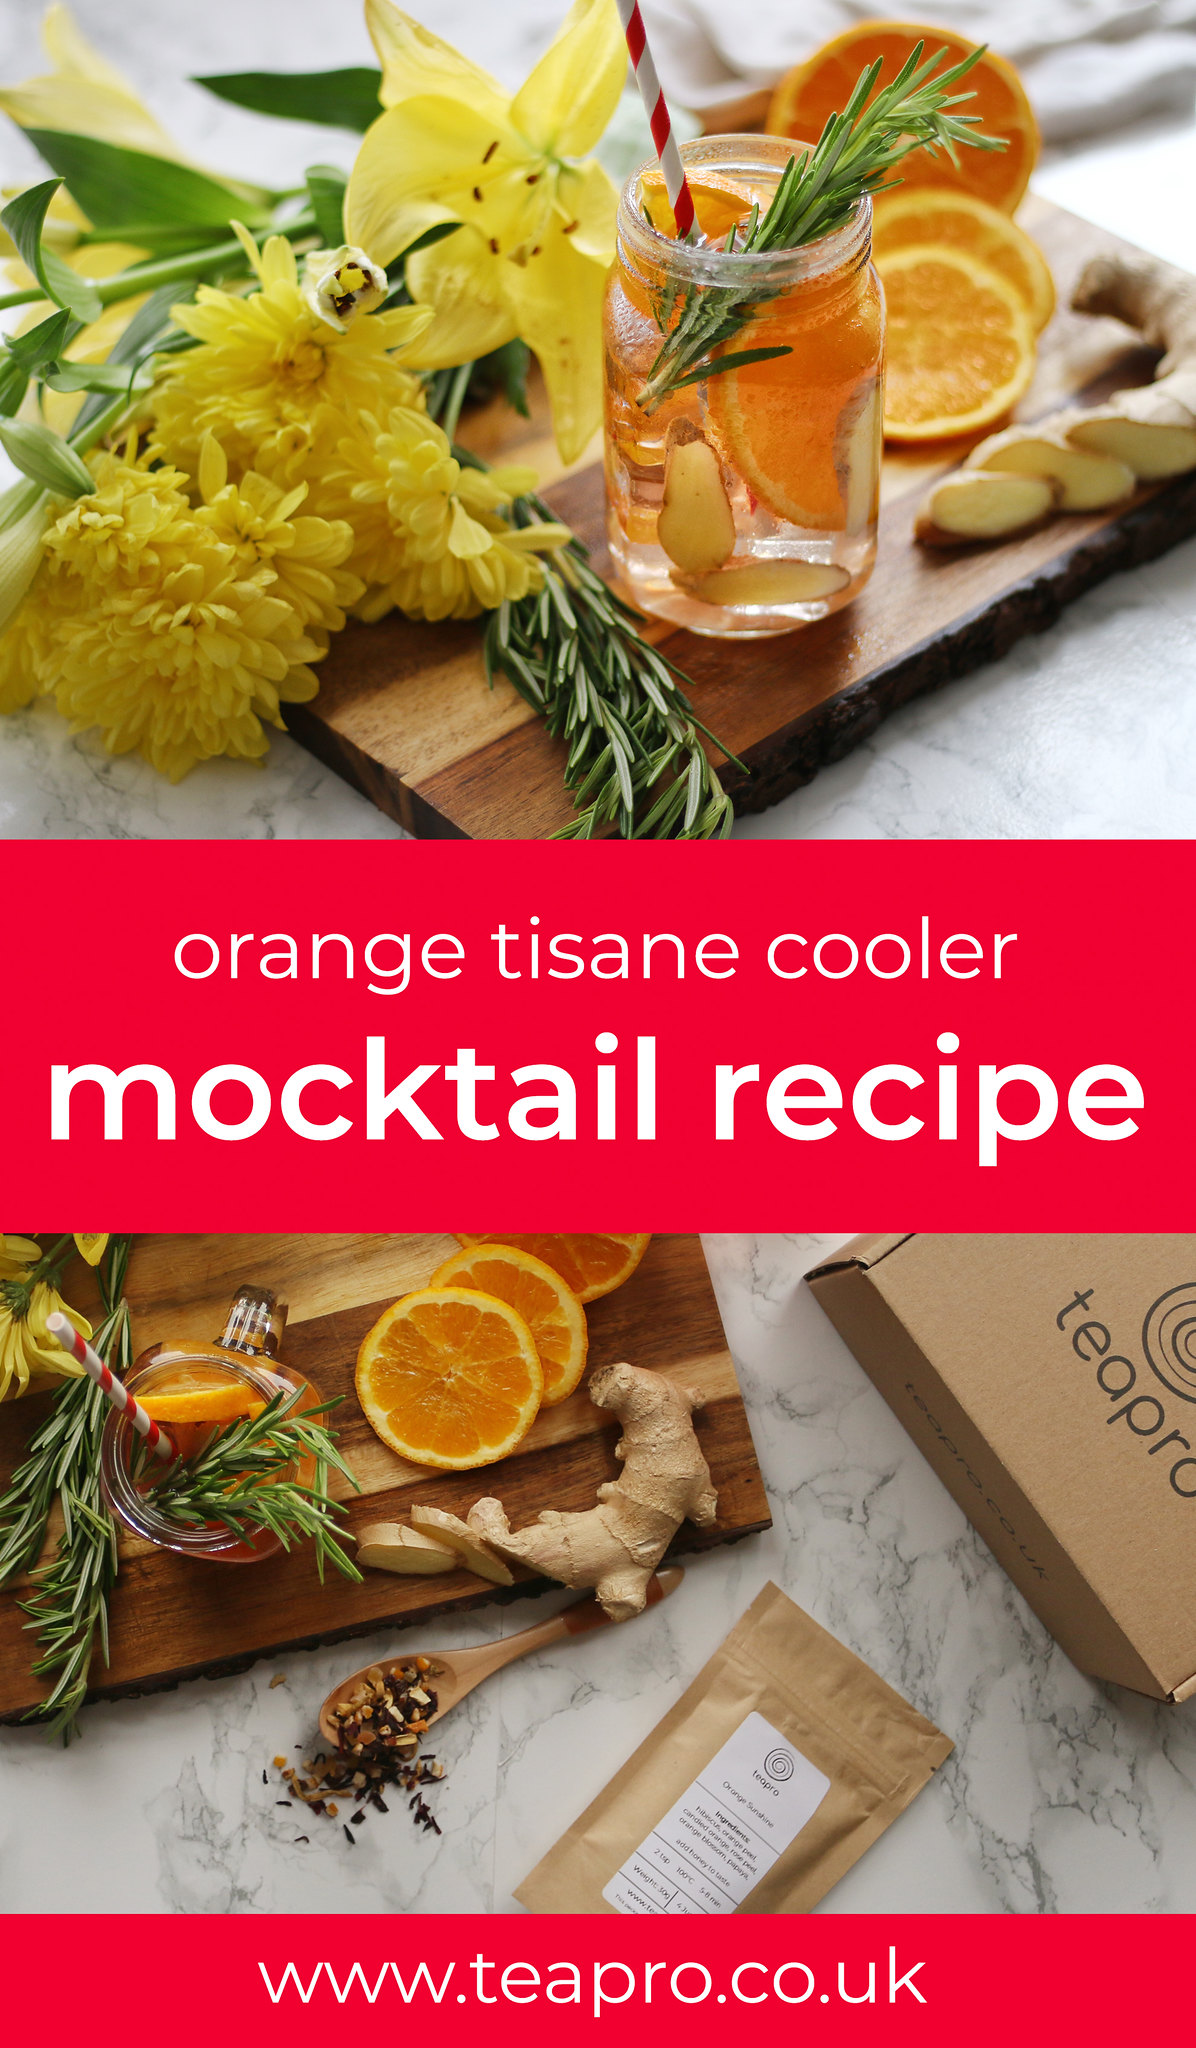 Teapro invigorating orange tisane recipe